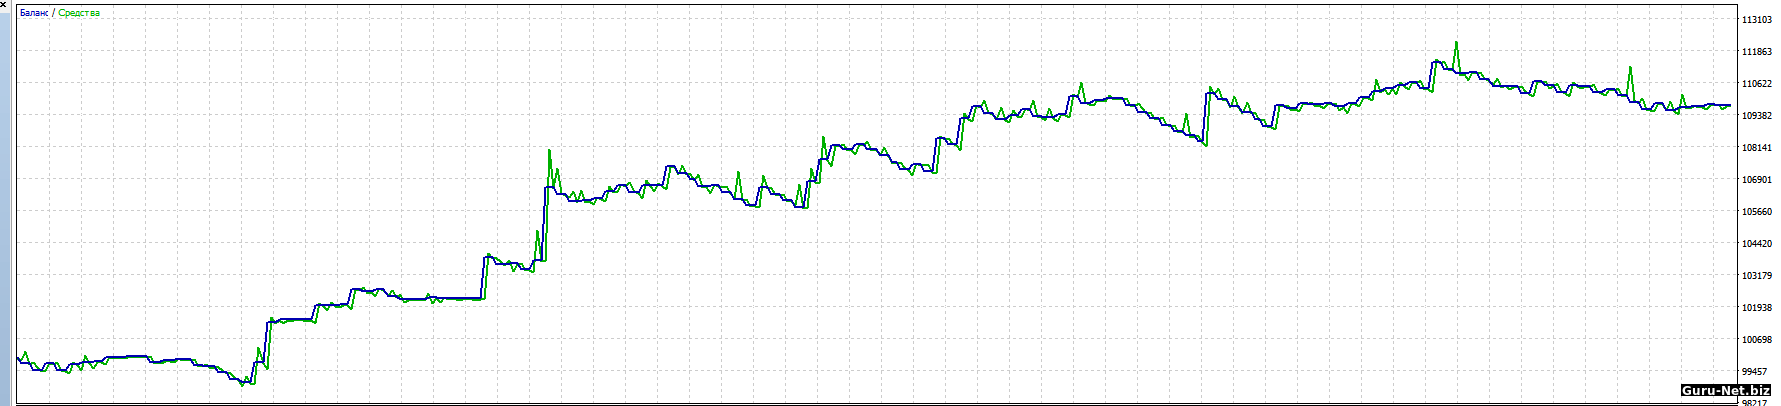 График доходности системы на Si-3.16